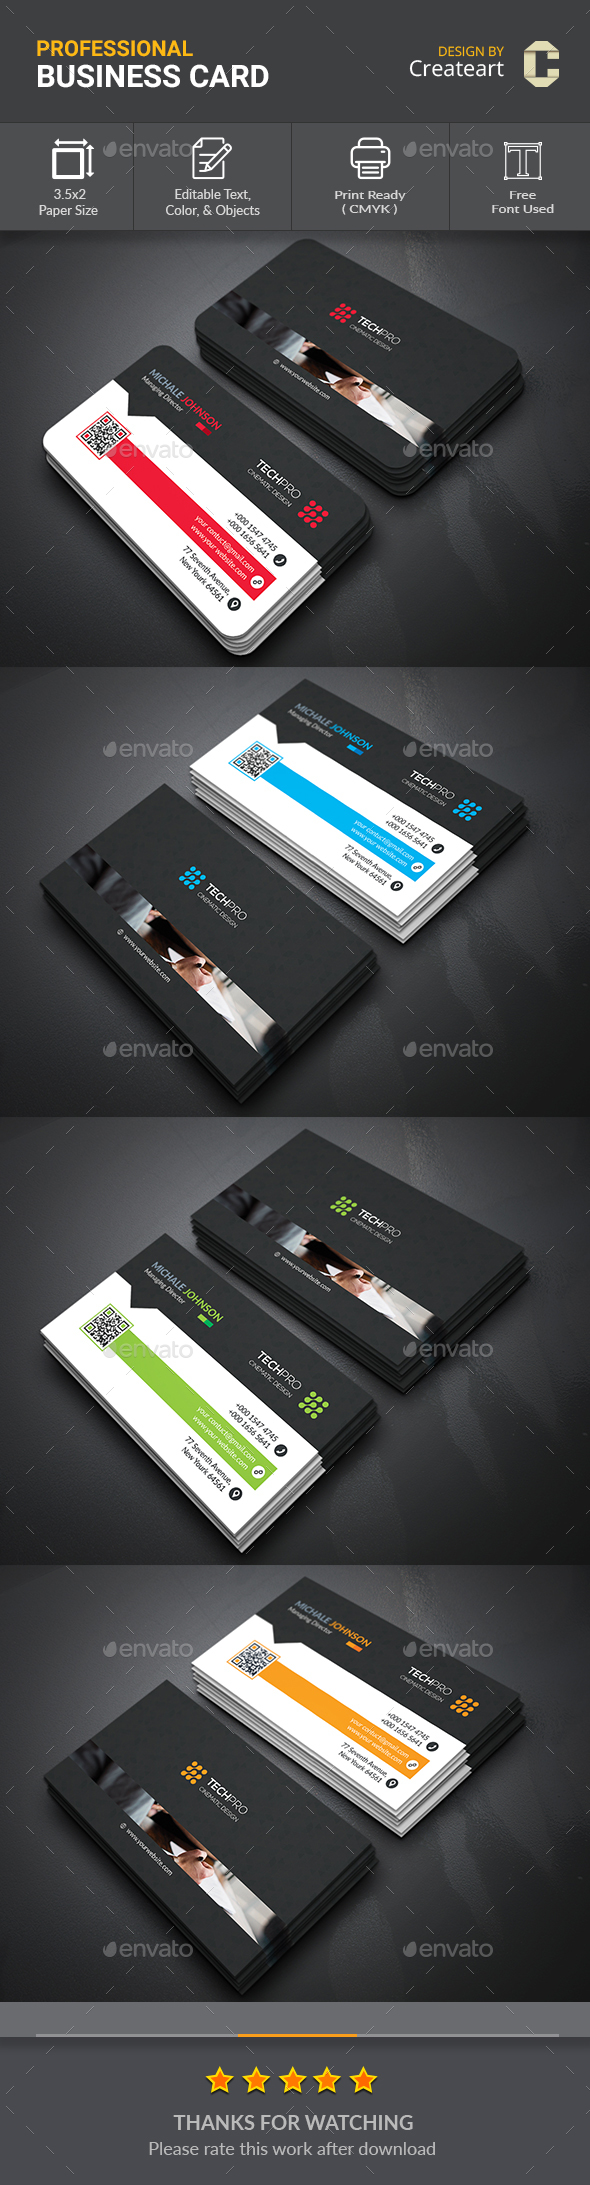 Creative Business Card - Business Cards Print Templates